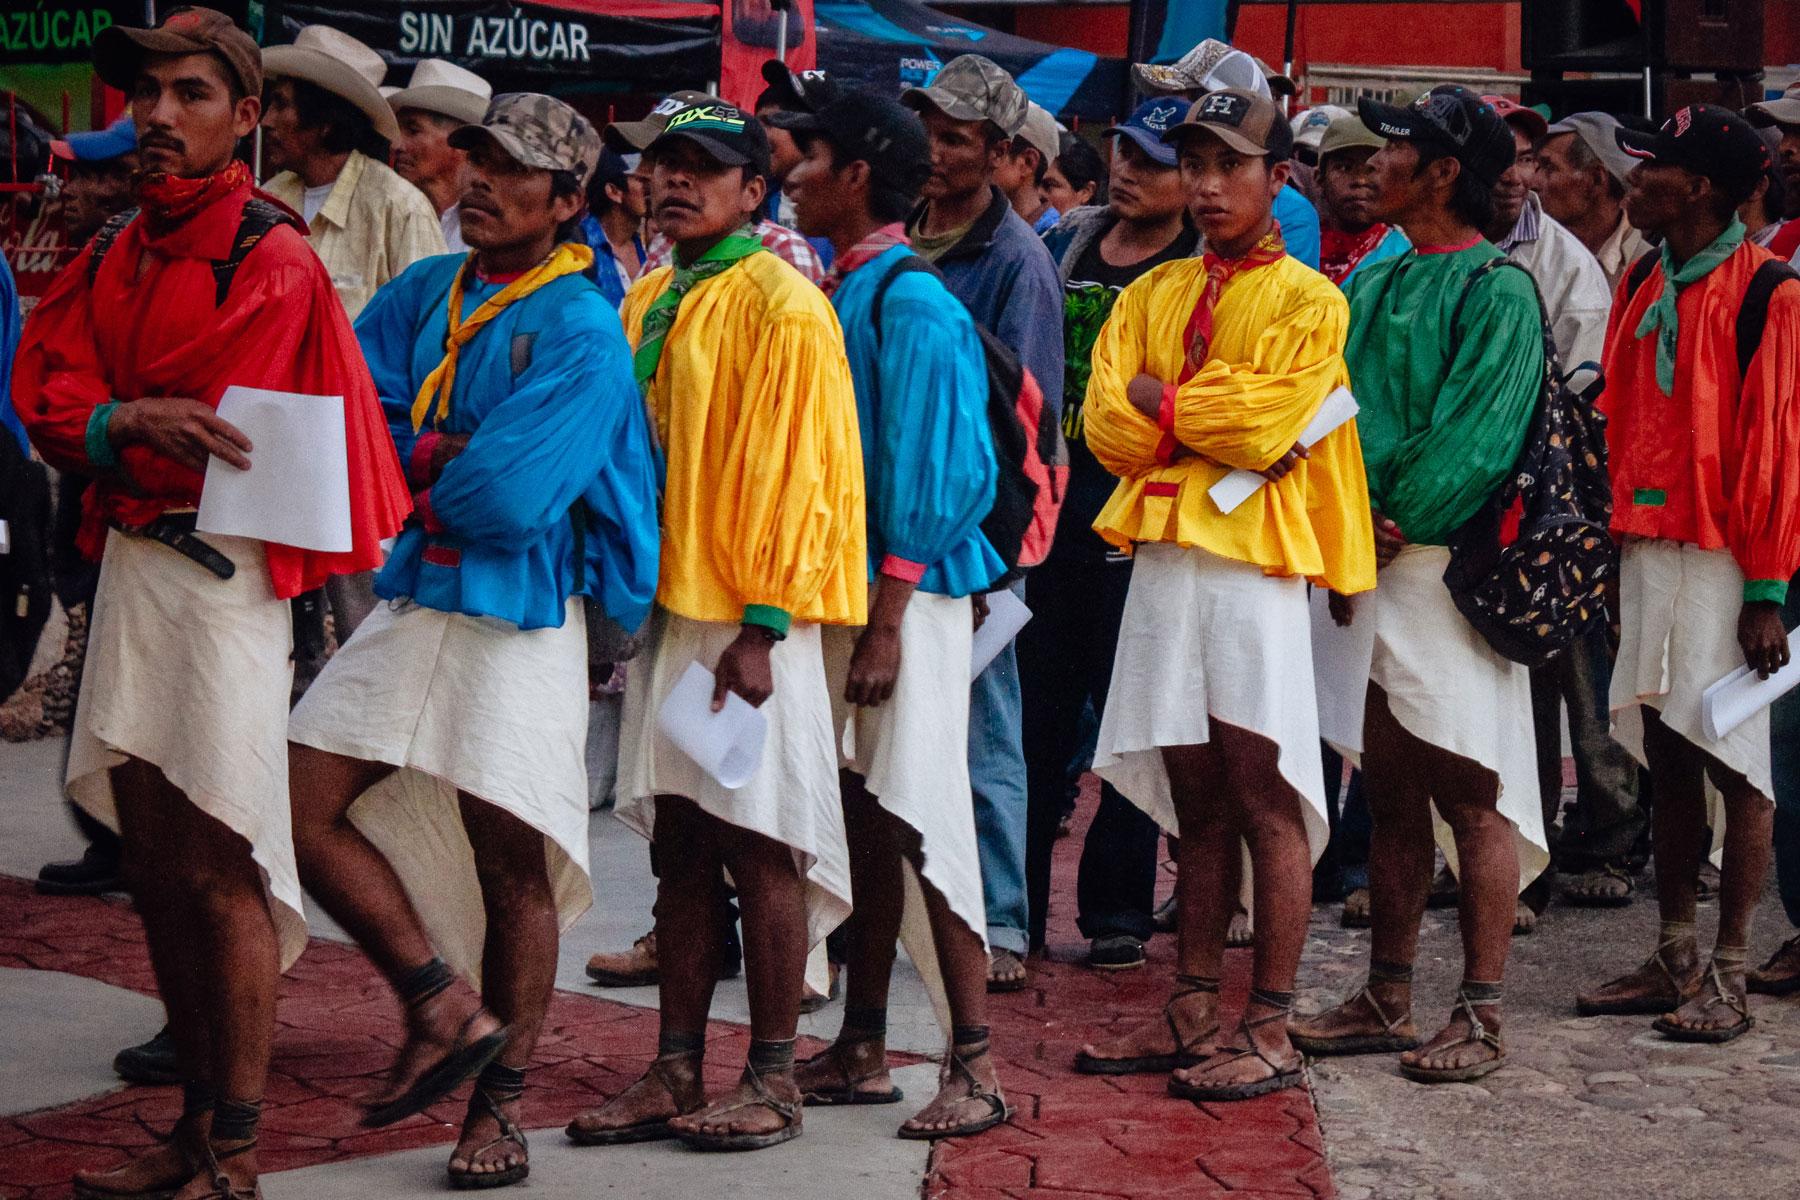 Raramuri men wait to pick up their bib numbers for the Caballo Blanco Ultramarathon.